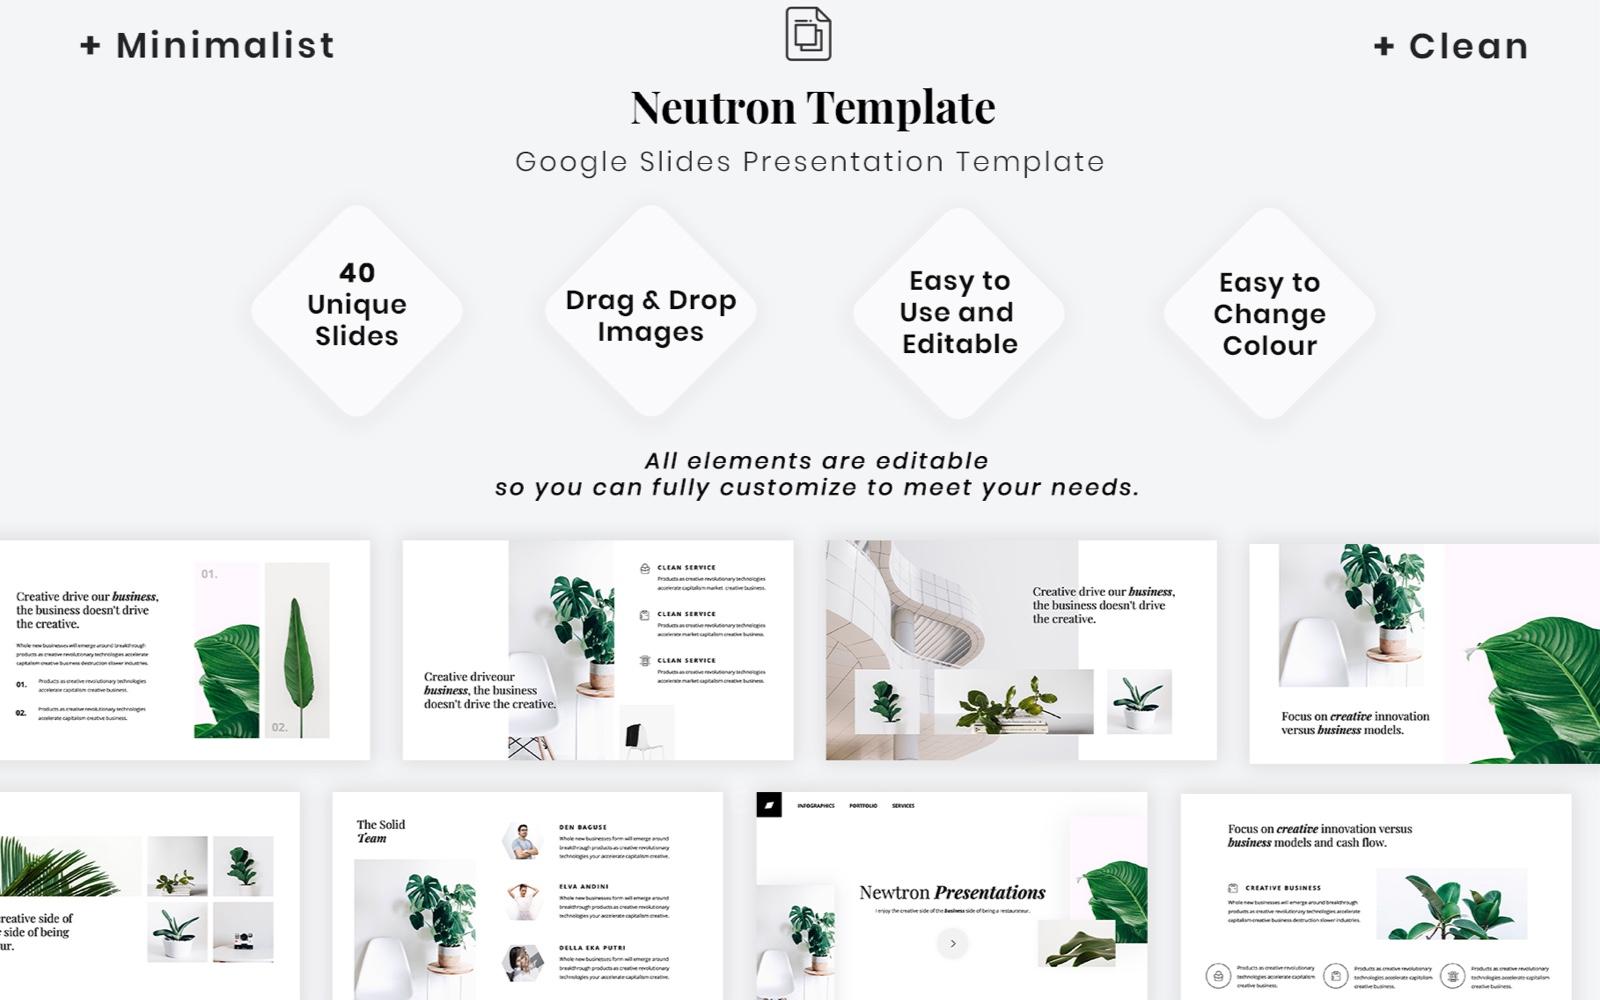 Google Slides Minimalist - Clean Presentation Template #102300